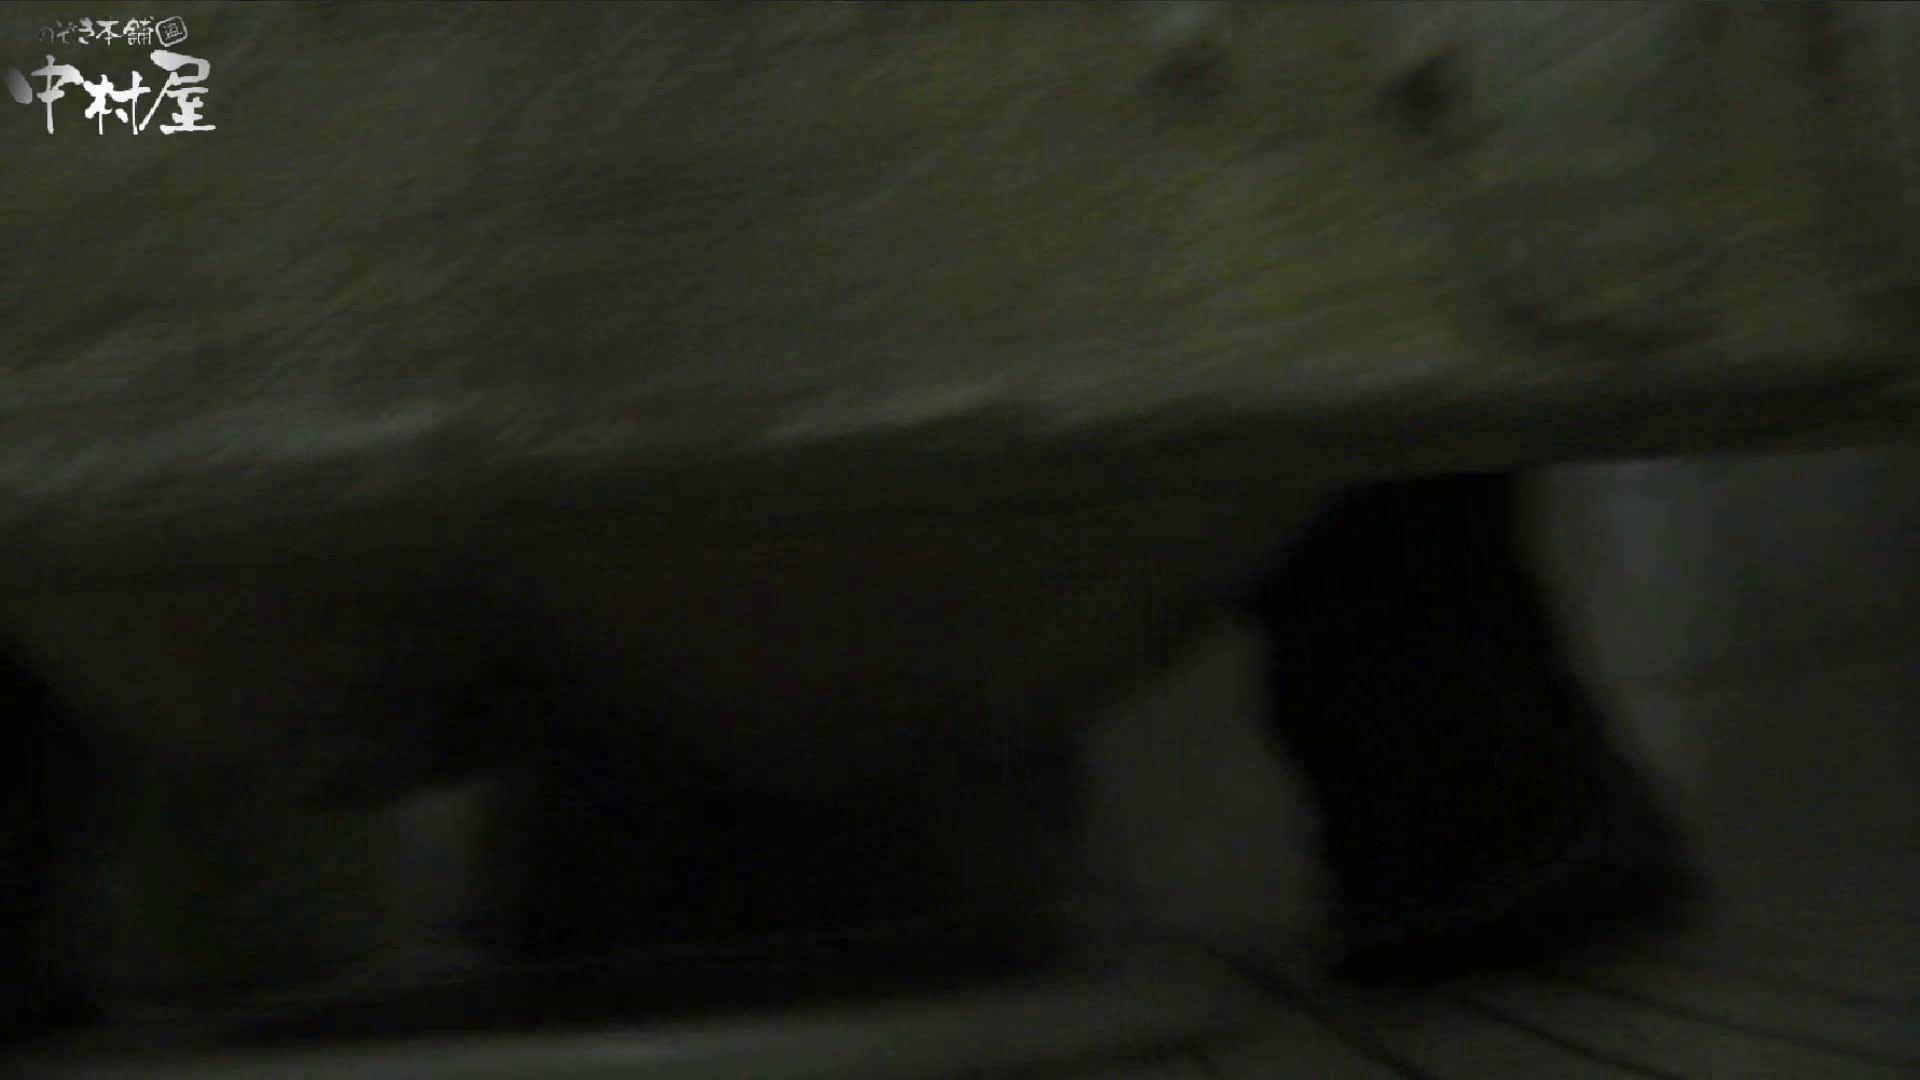 vol.44 命がけ潜伏洗面所! ツインテール(゚∀゚)キタコレ!! プライベート 盗み撮りオマンコ動画キャプチャ 107画像 71